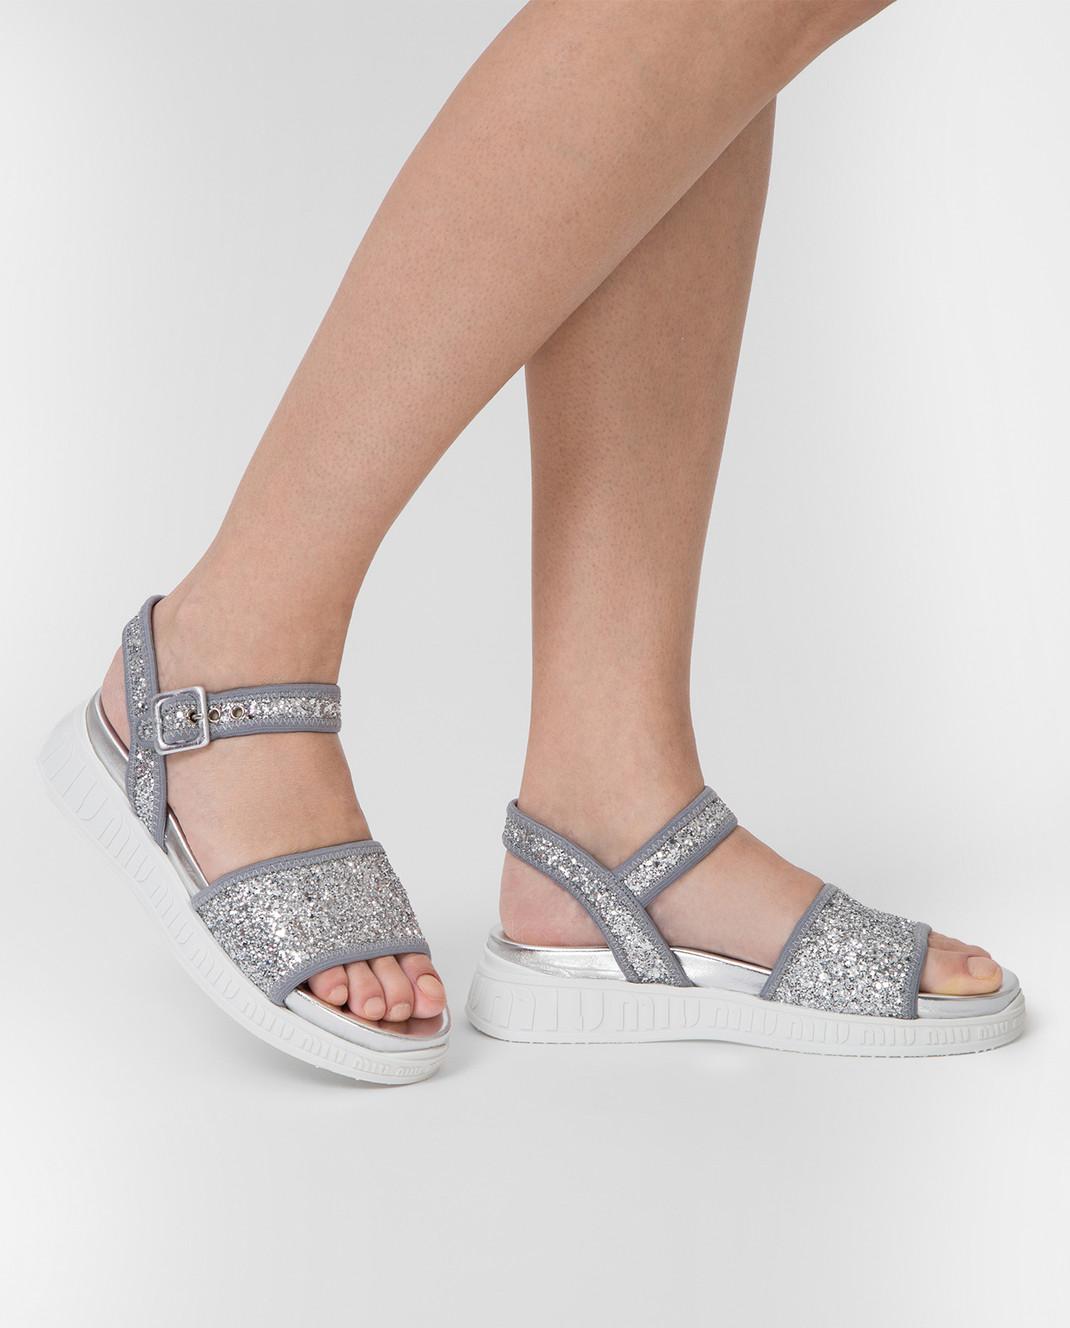 Miu Miu Серебристые сандалии 5X323C3ABQ изображение 2